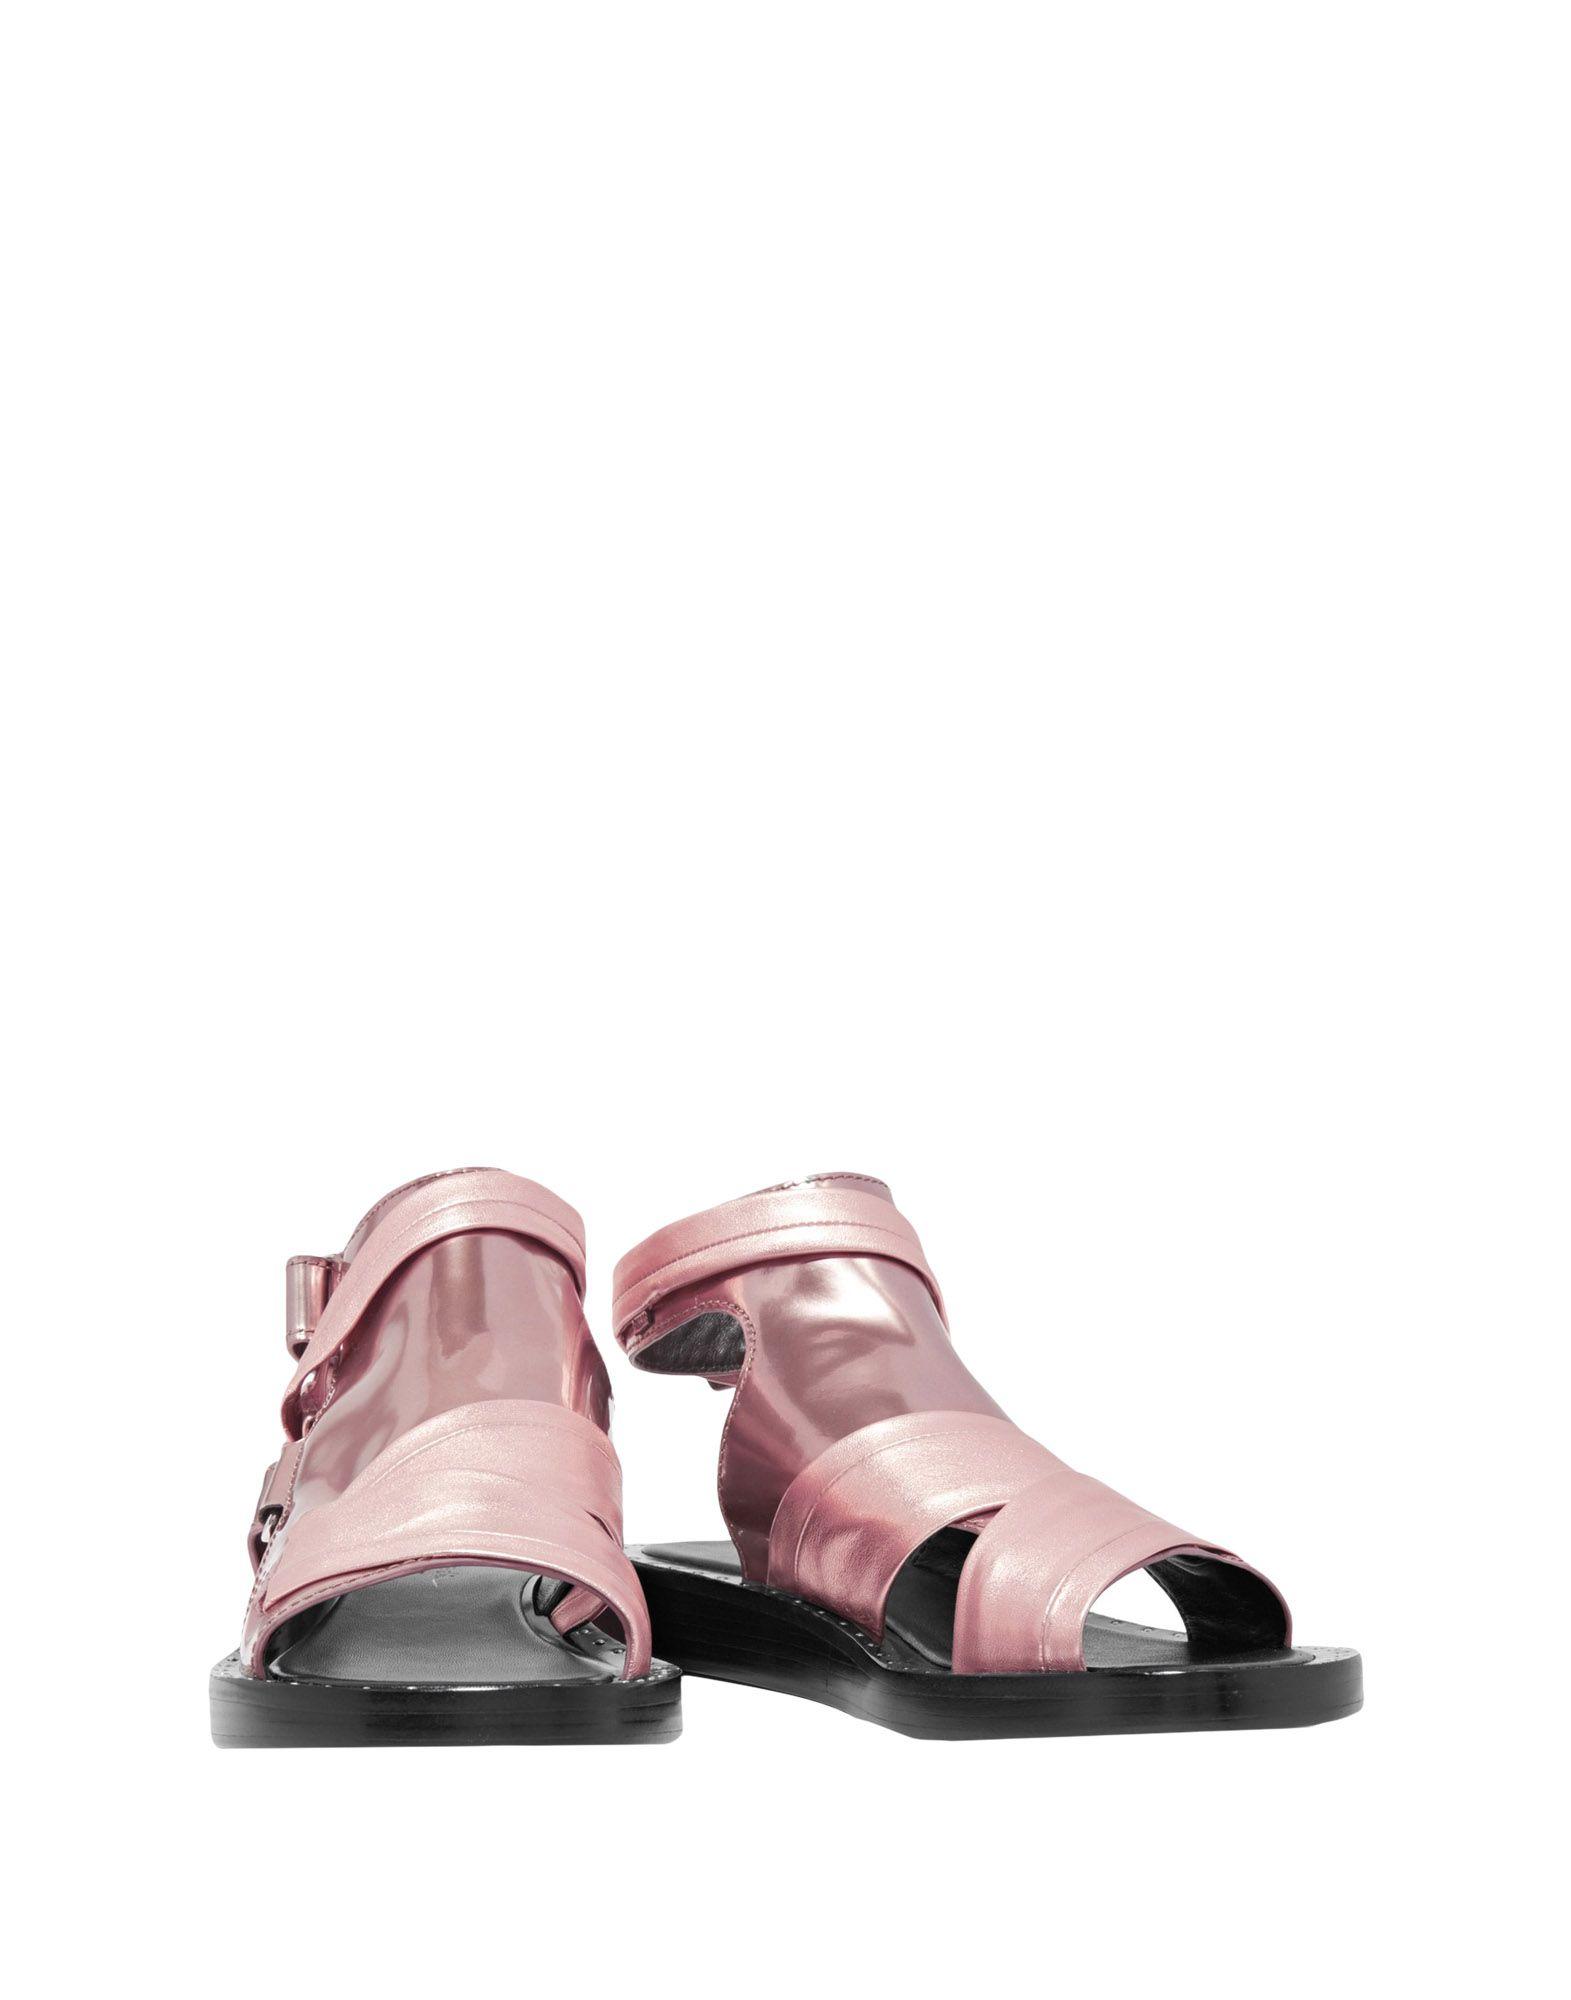 3.1 Phillip Lim Sandalen Damen  11524297MQGut 11524297MQGut 11524297MQGut aussehende strapazierfähige Schuhe 44ccab